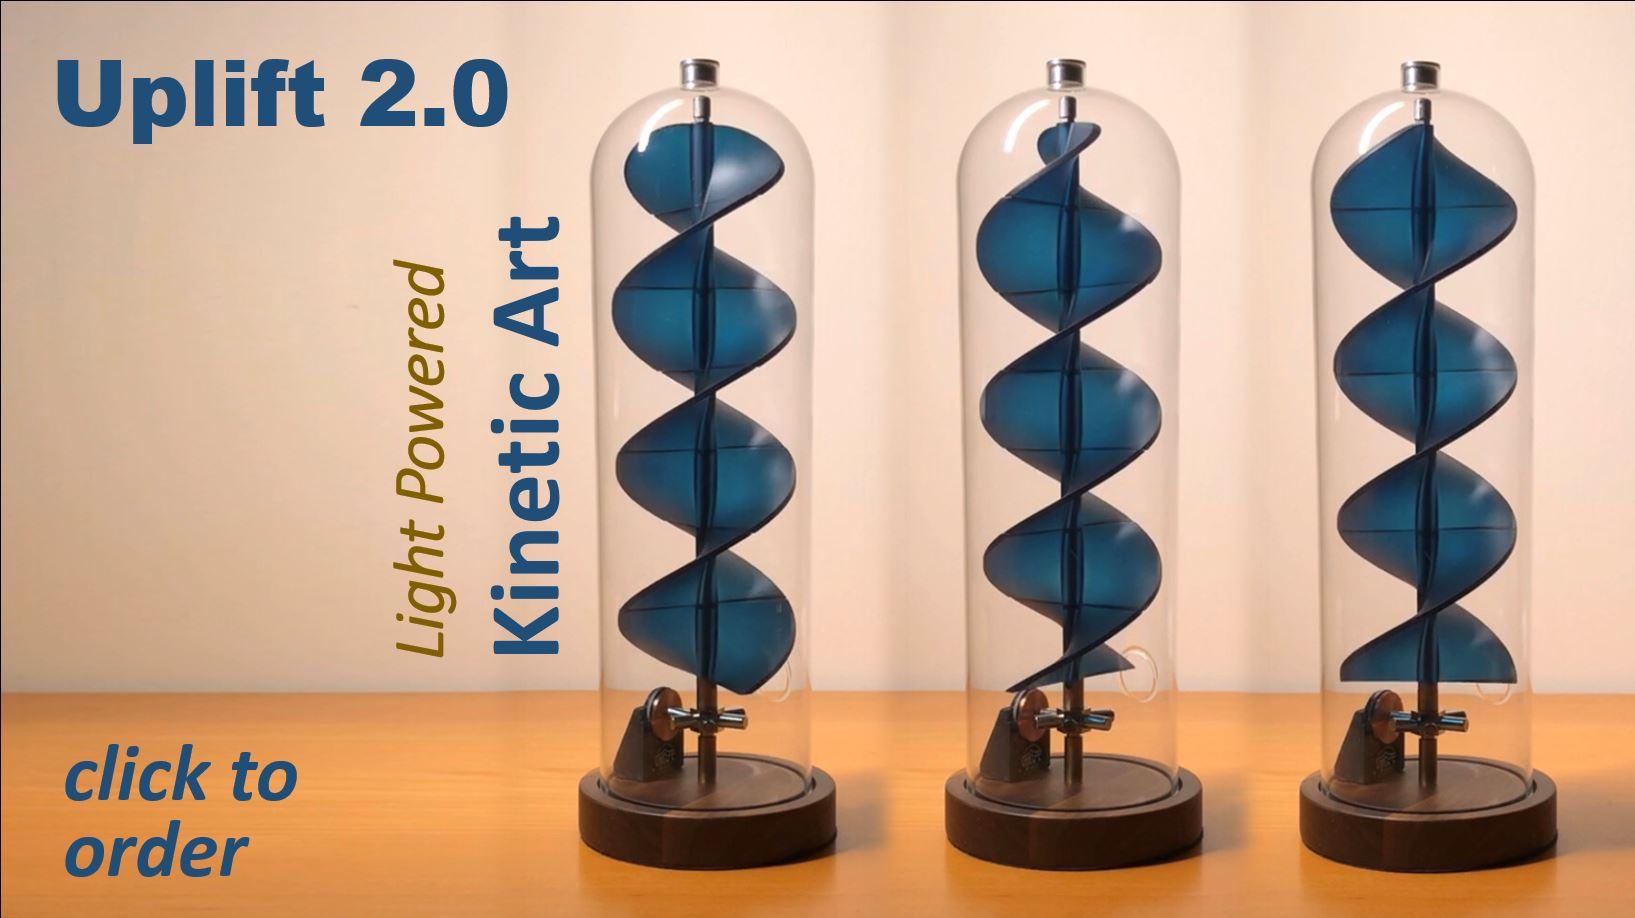 Uplift 2.0